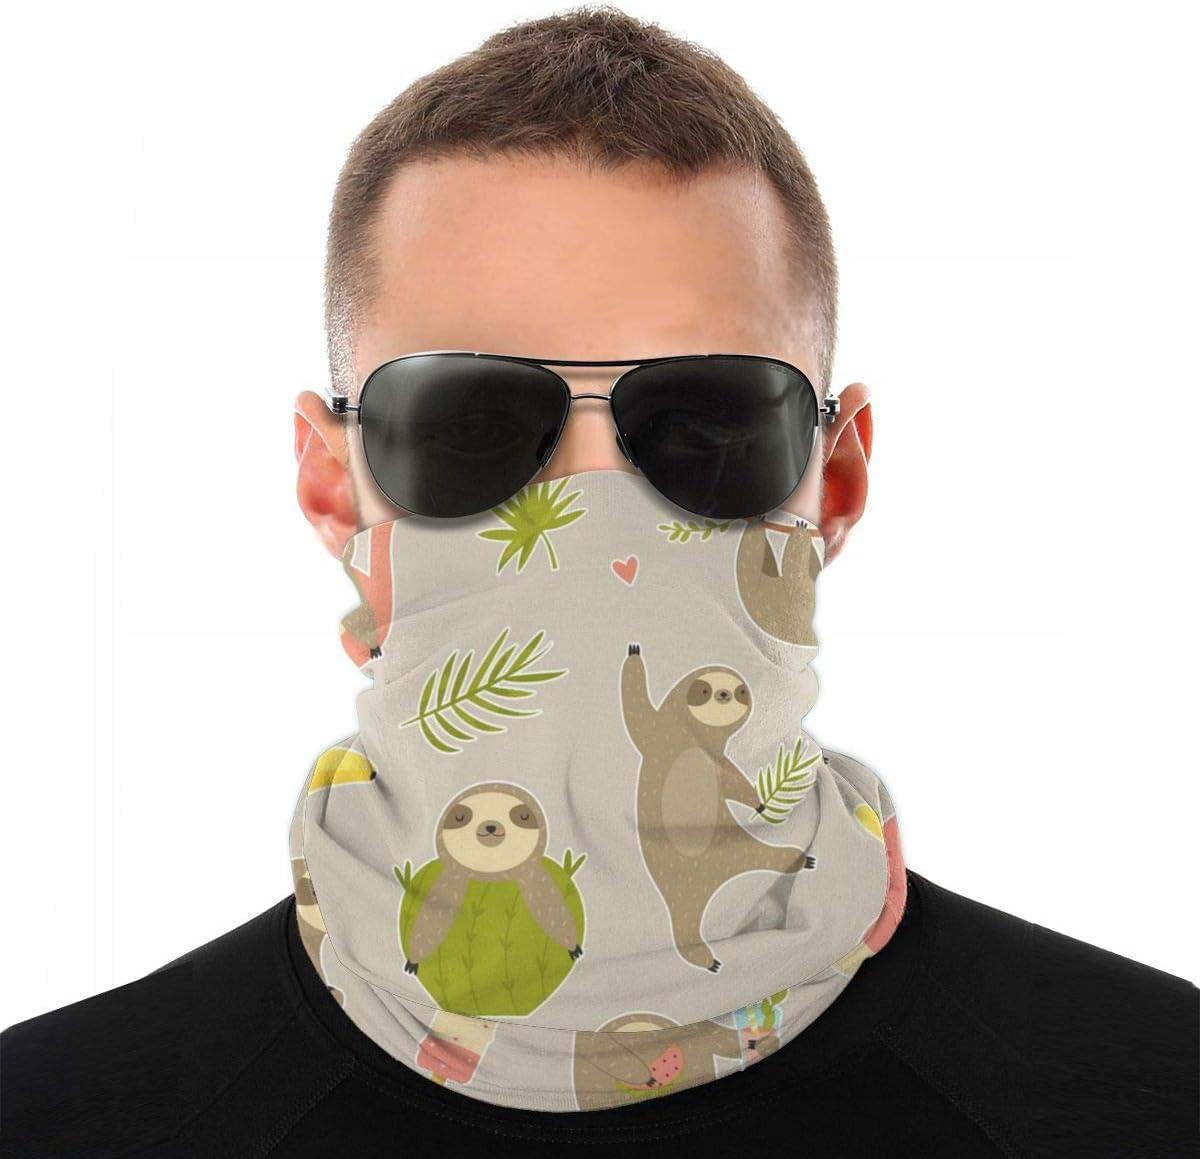 RTBB - Pañuelo de cabeza con bolsillo interior, resistente al sol, cuello cálido, para deportes al aire libre